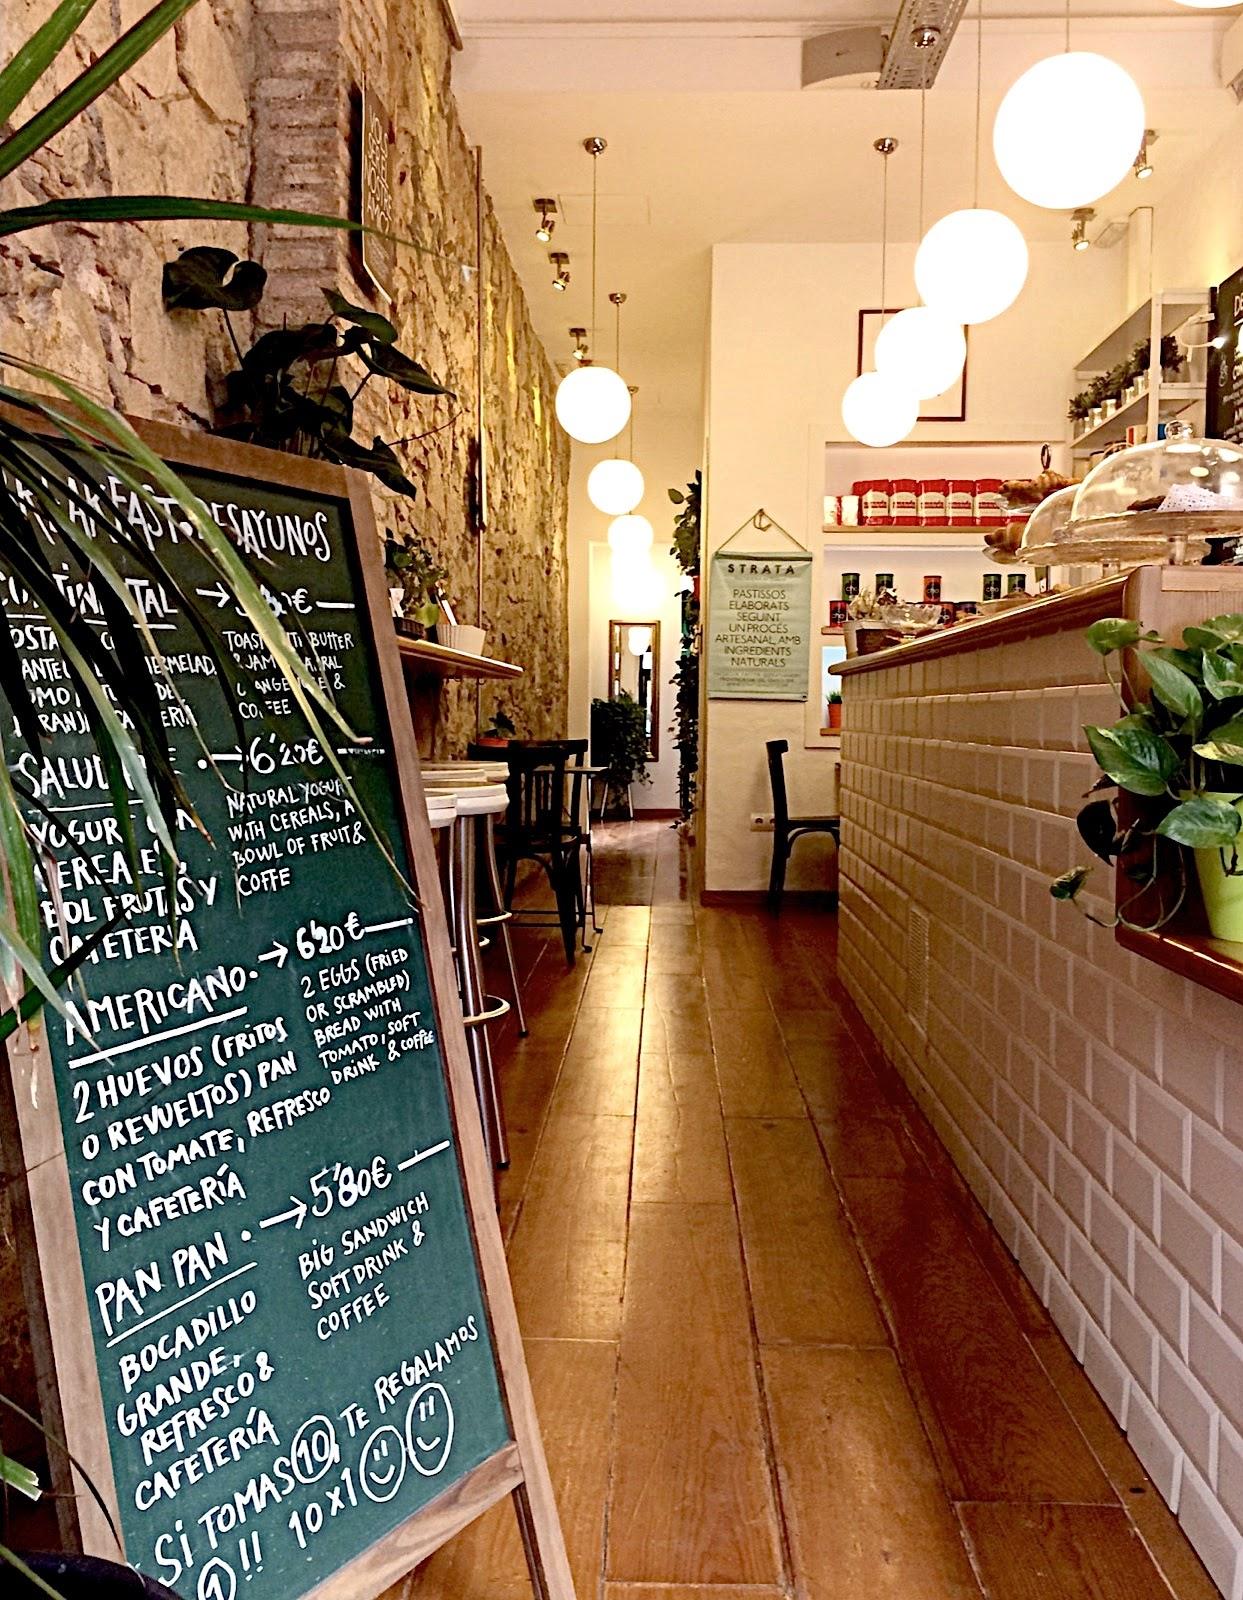 Strata Bakery